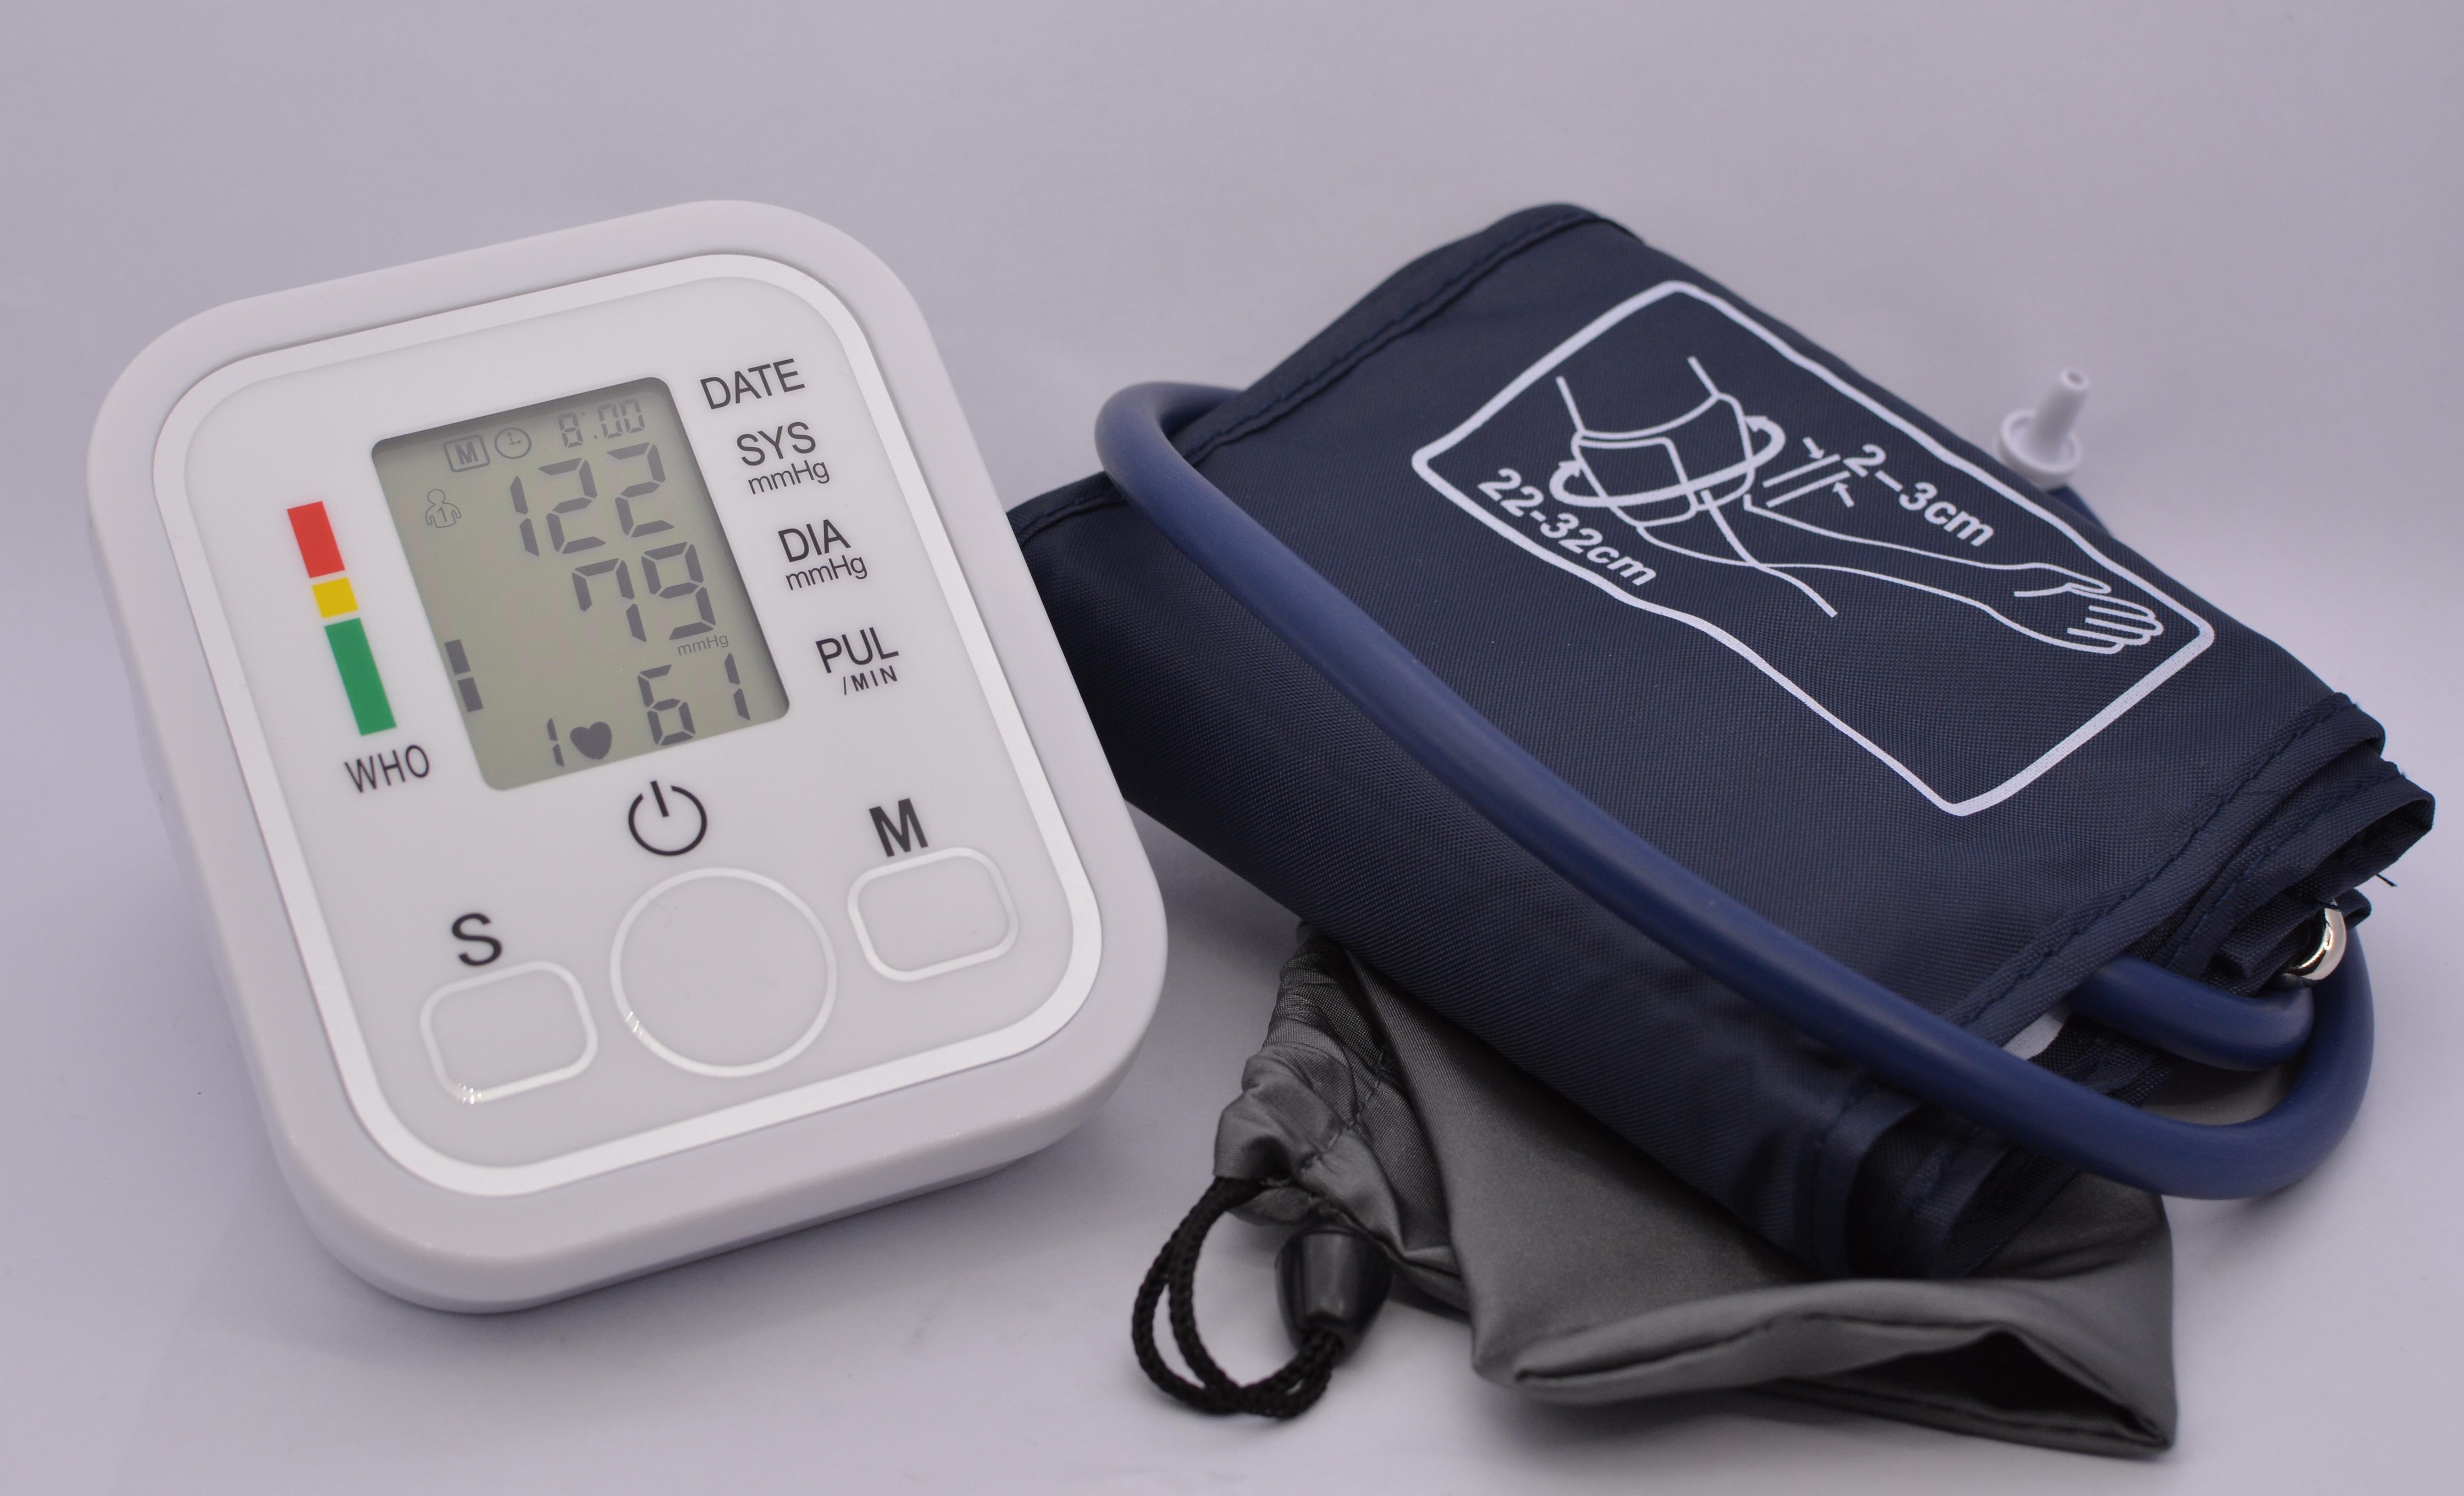 Tensiometru de brat Optimus AT RZ202 automat, oscilometric, manseta 22-32 cm, alimentare la priza / baterii 4xAAA, 2 utilizatori x 99 memorii, 40-280 mmHg, 40-199 bpm [6]